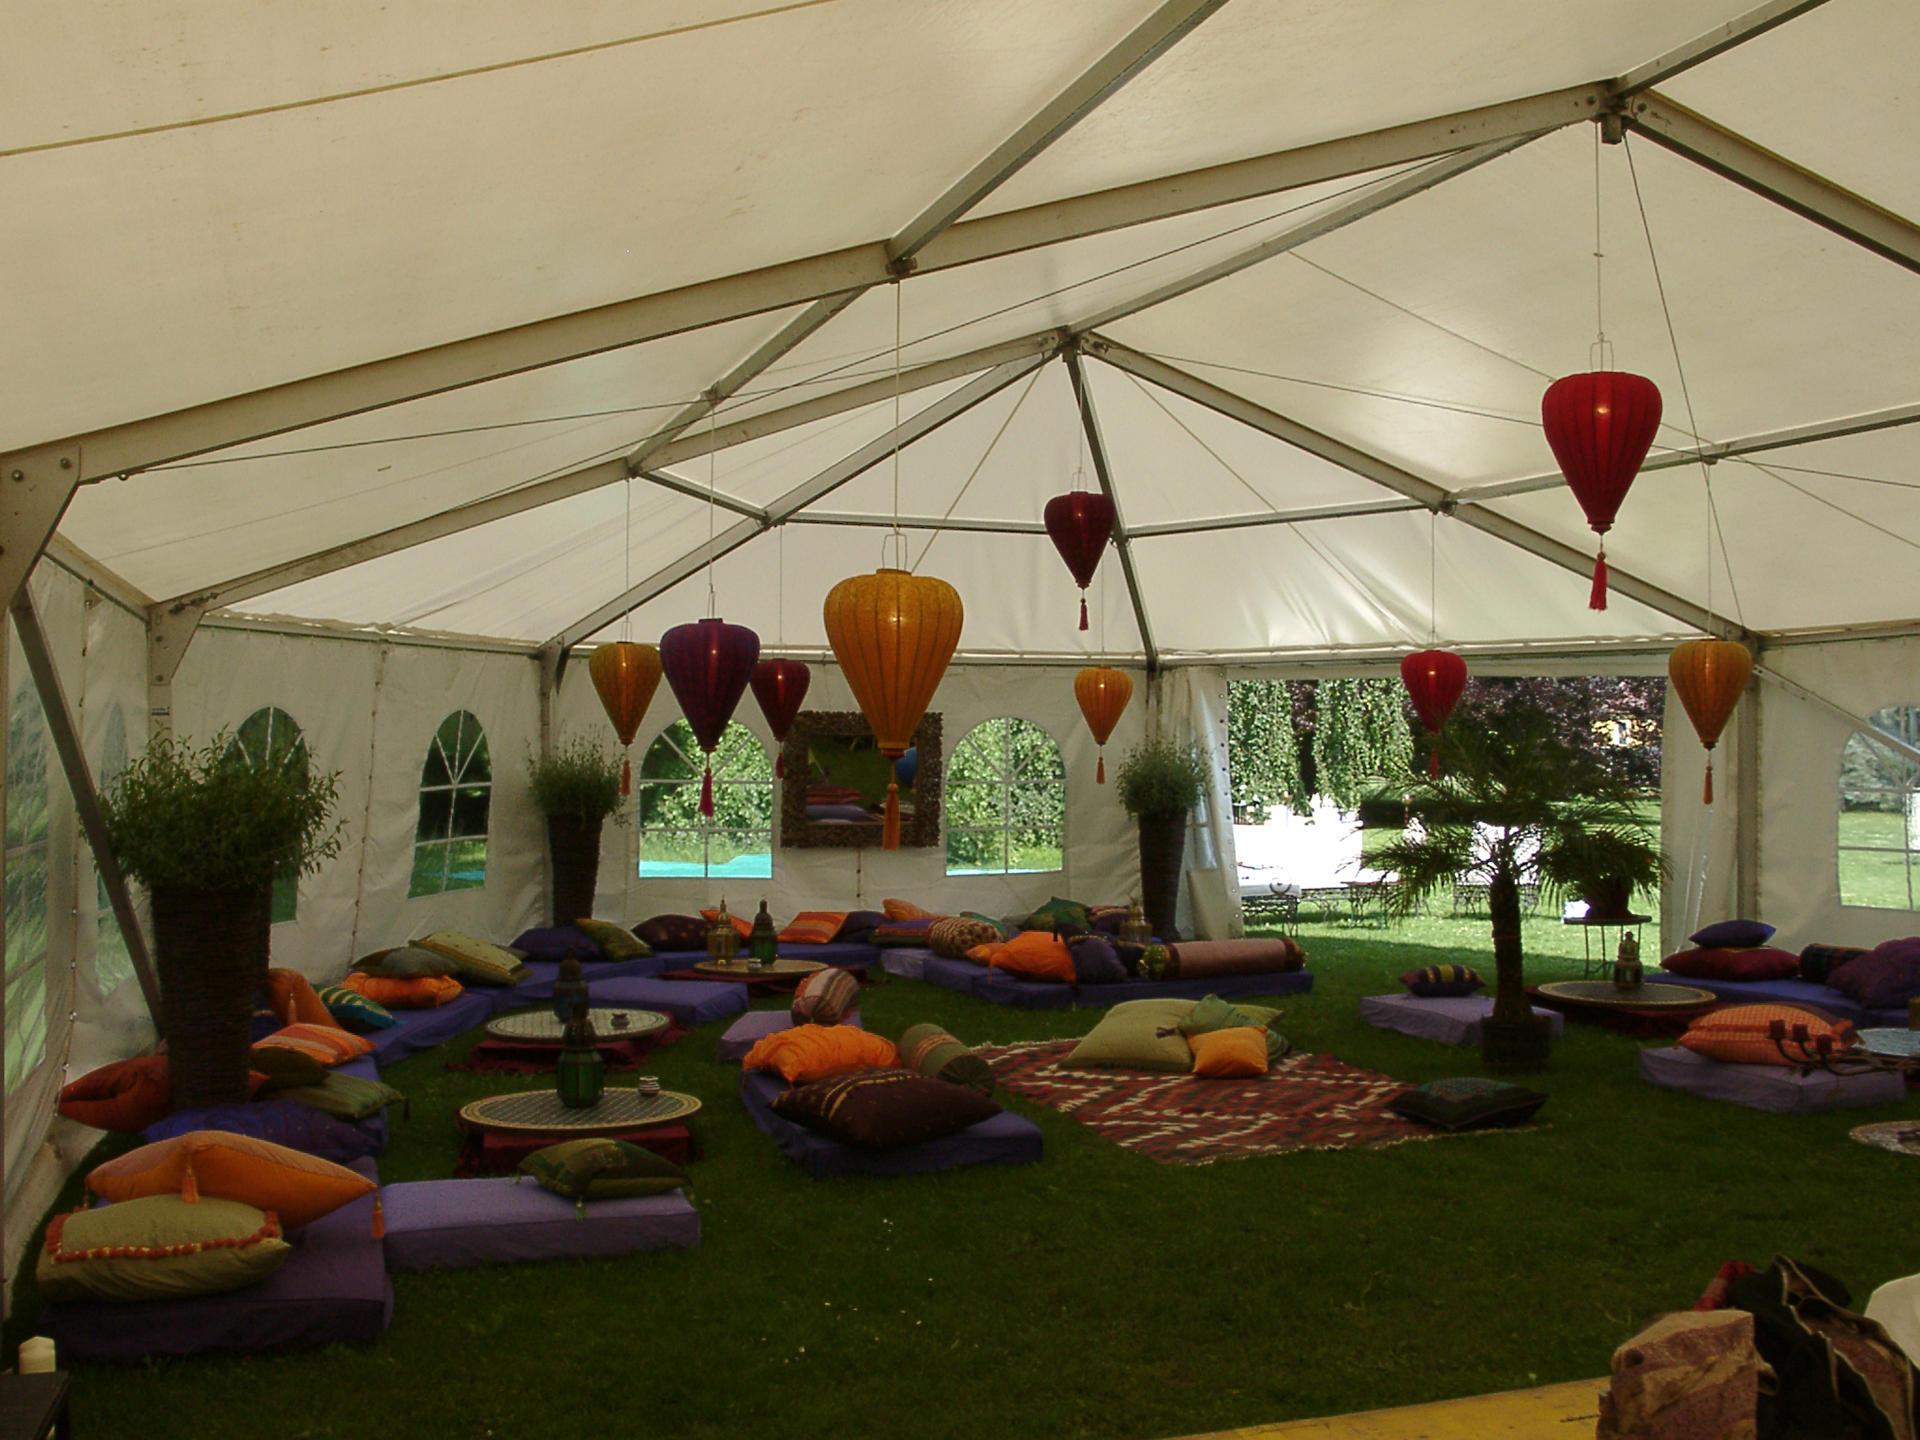 RenT A TenT Eventservice GmbH